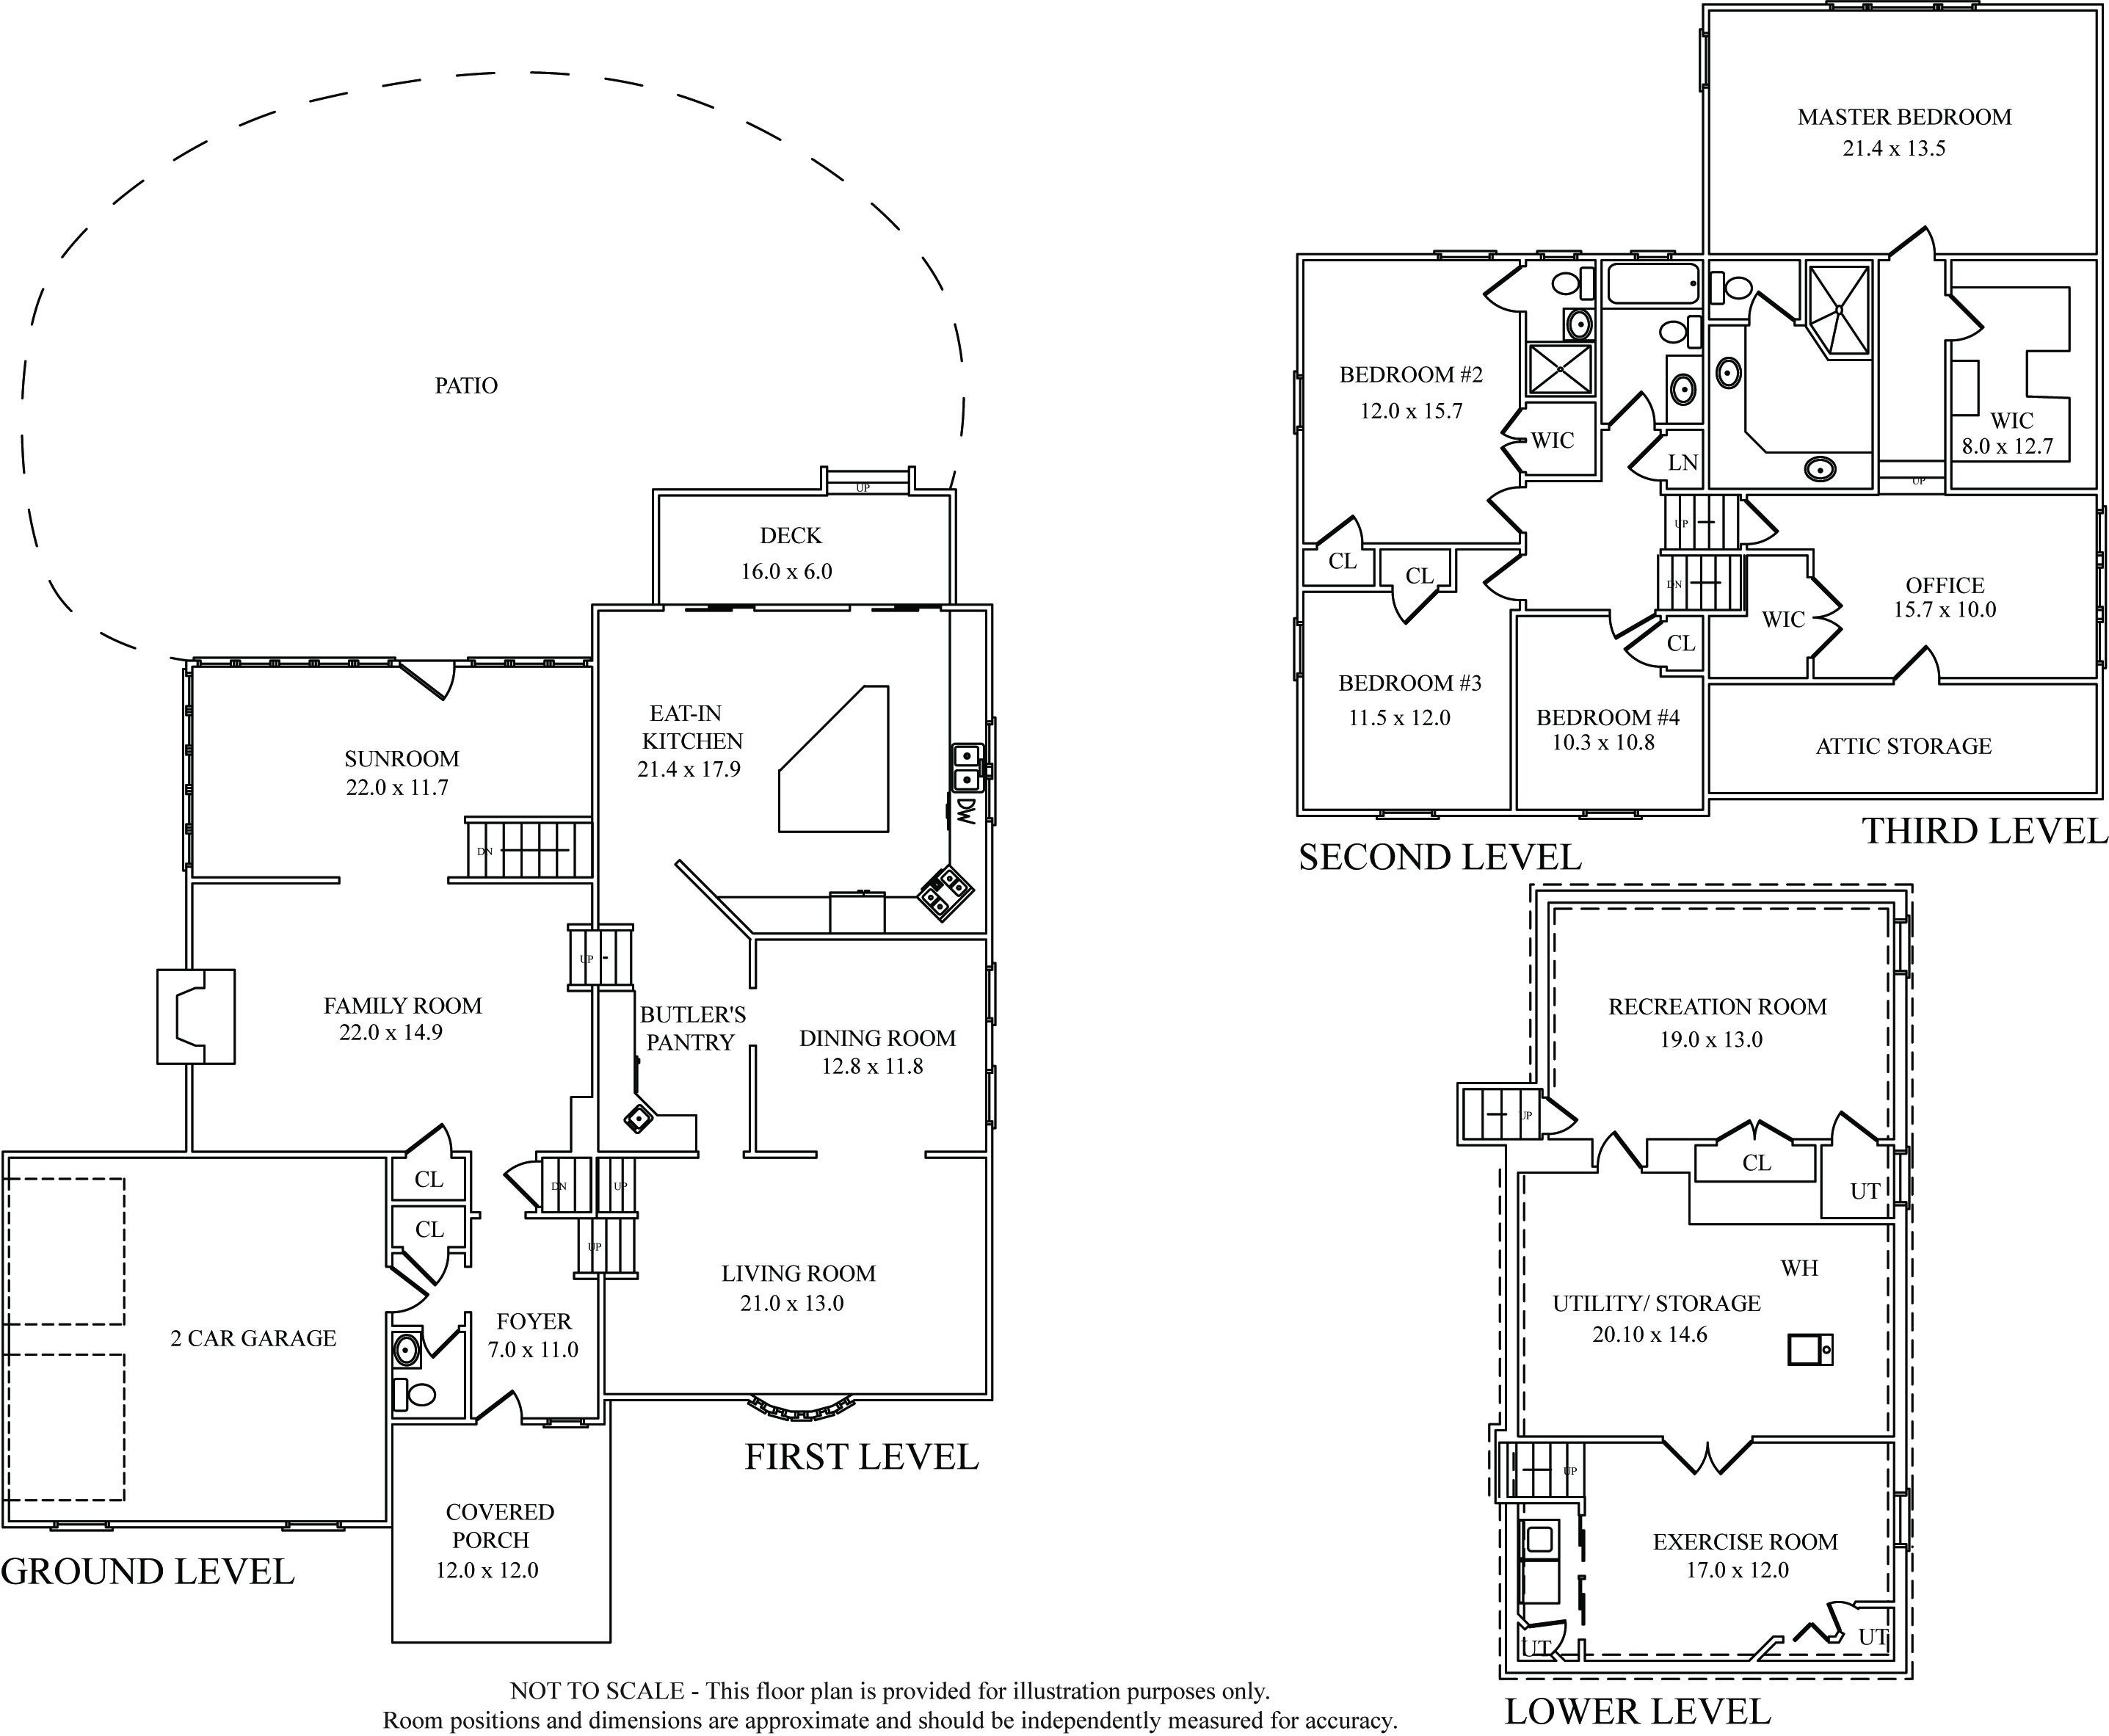 ... Backyard Oasis Storage And Entertaining Station By 4 Huron Path Scotch  Plains Nj 07076 Sue Adler ...